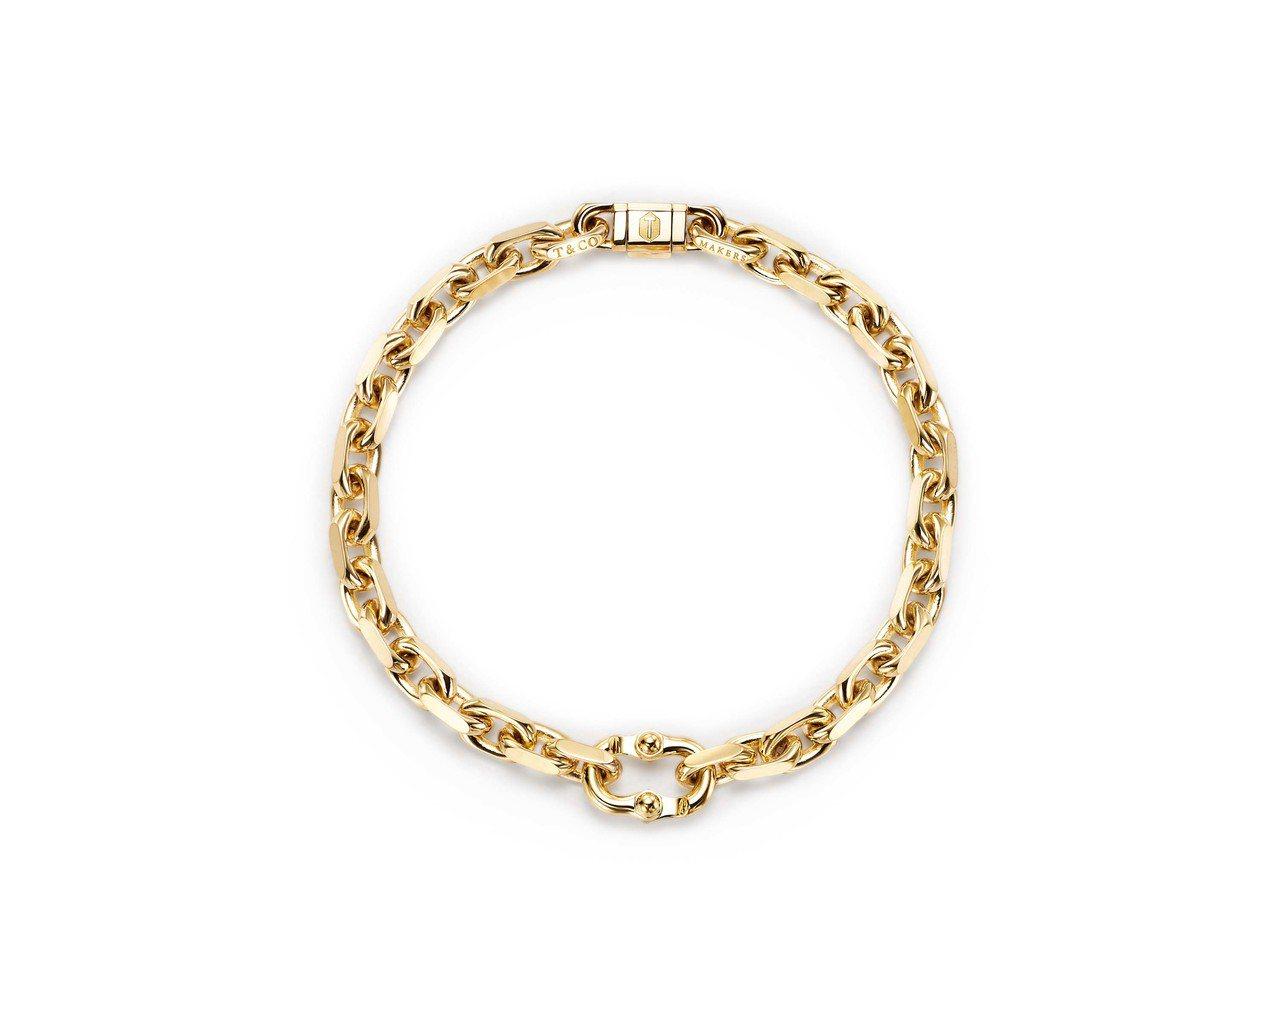 Tiffany 1837 Makers 18K金窄版手鍊,約24萬元。圖/Tif...